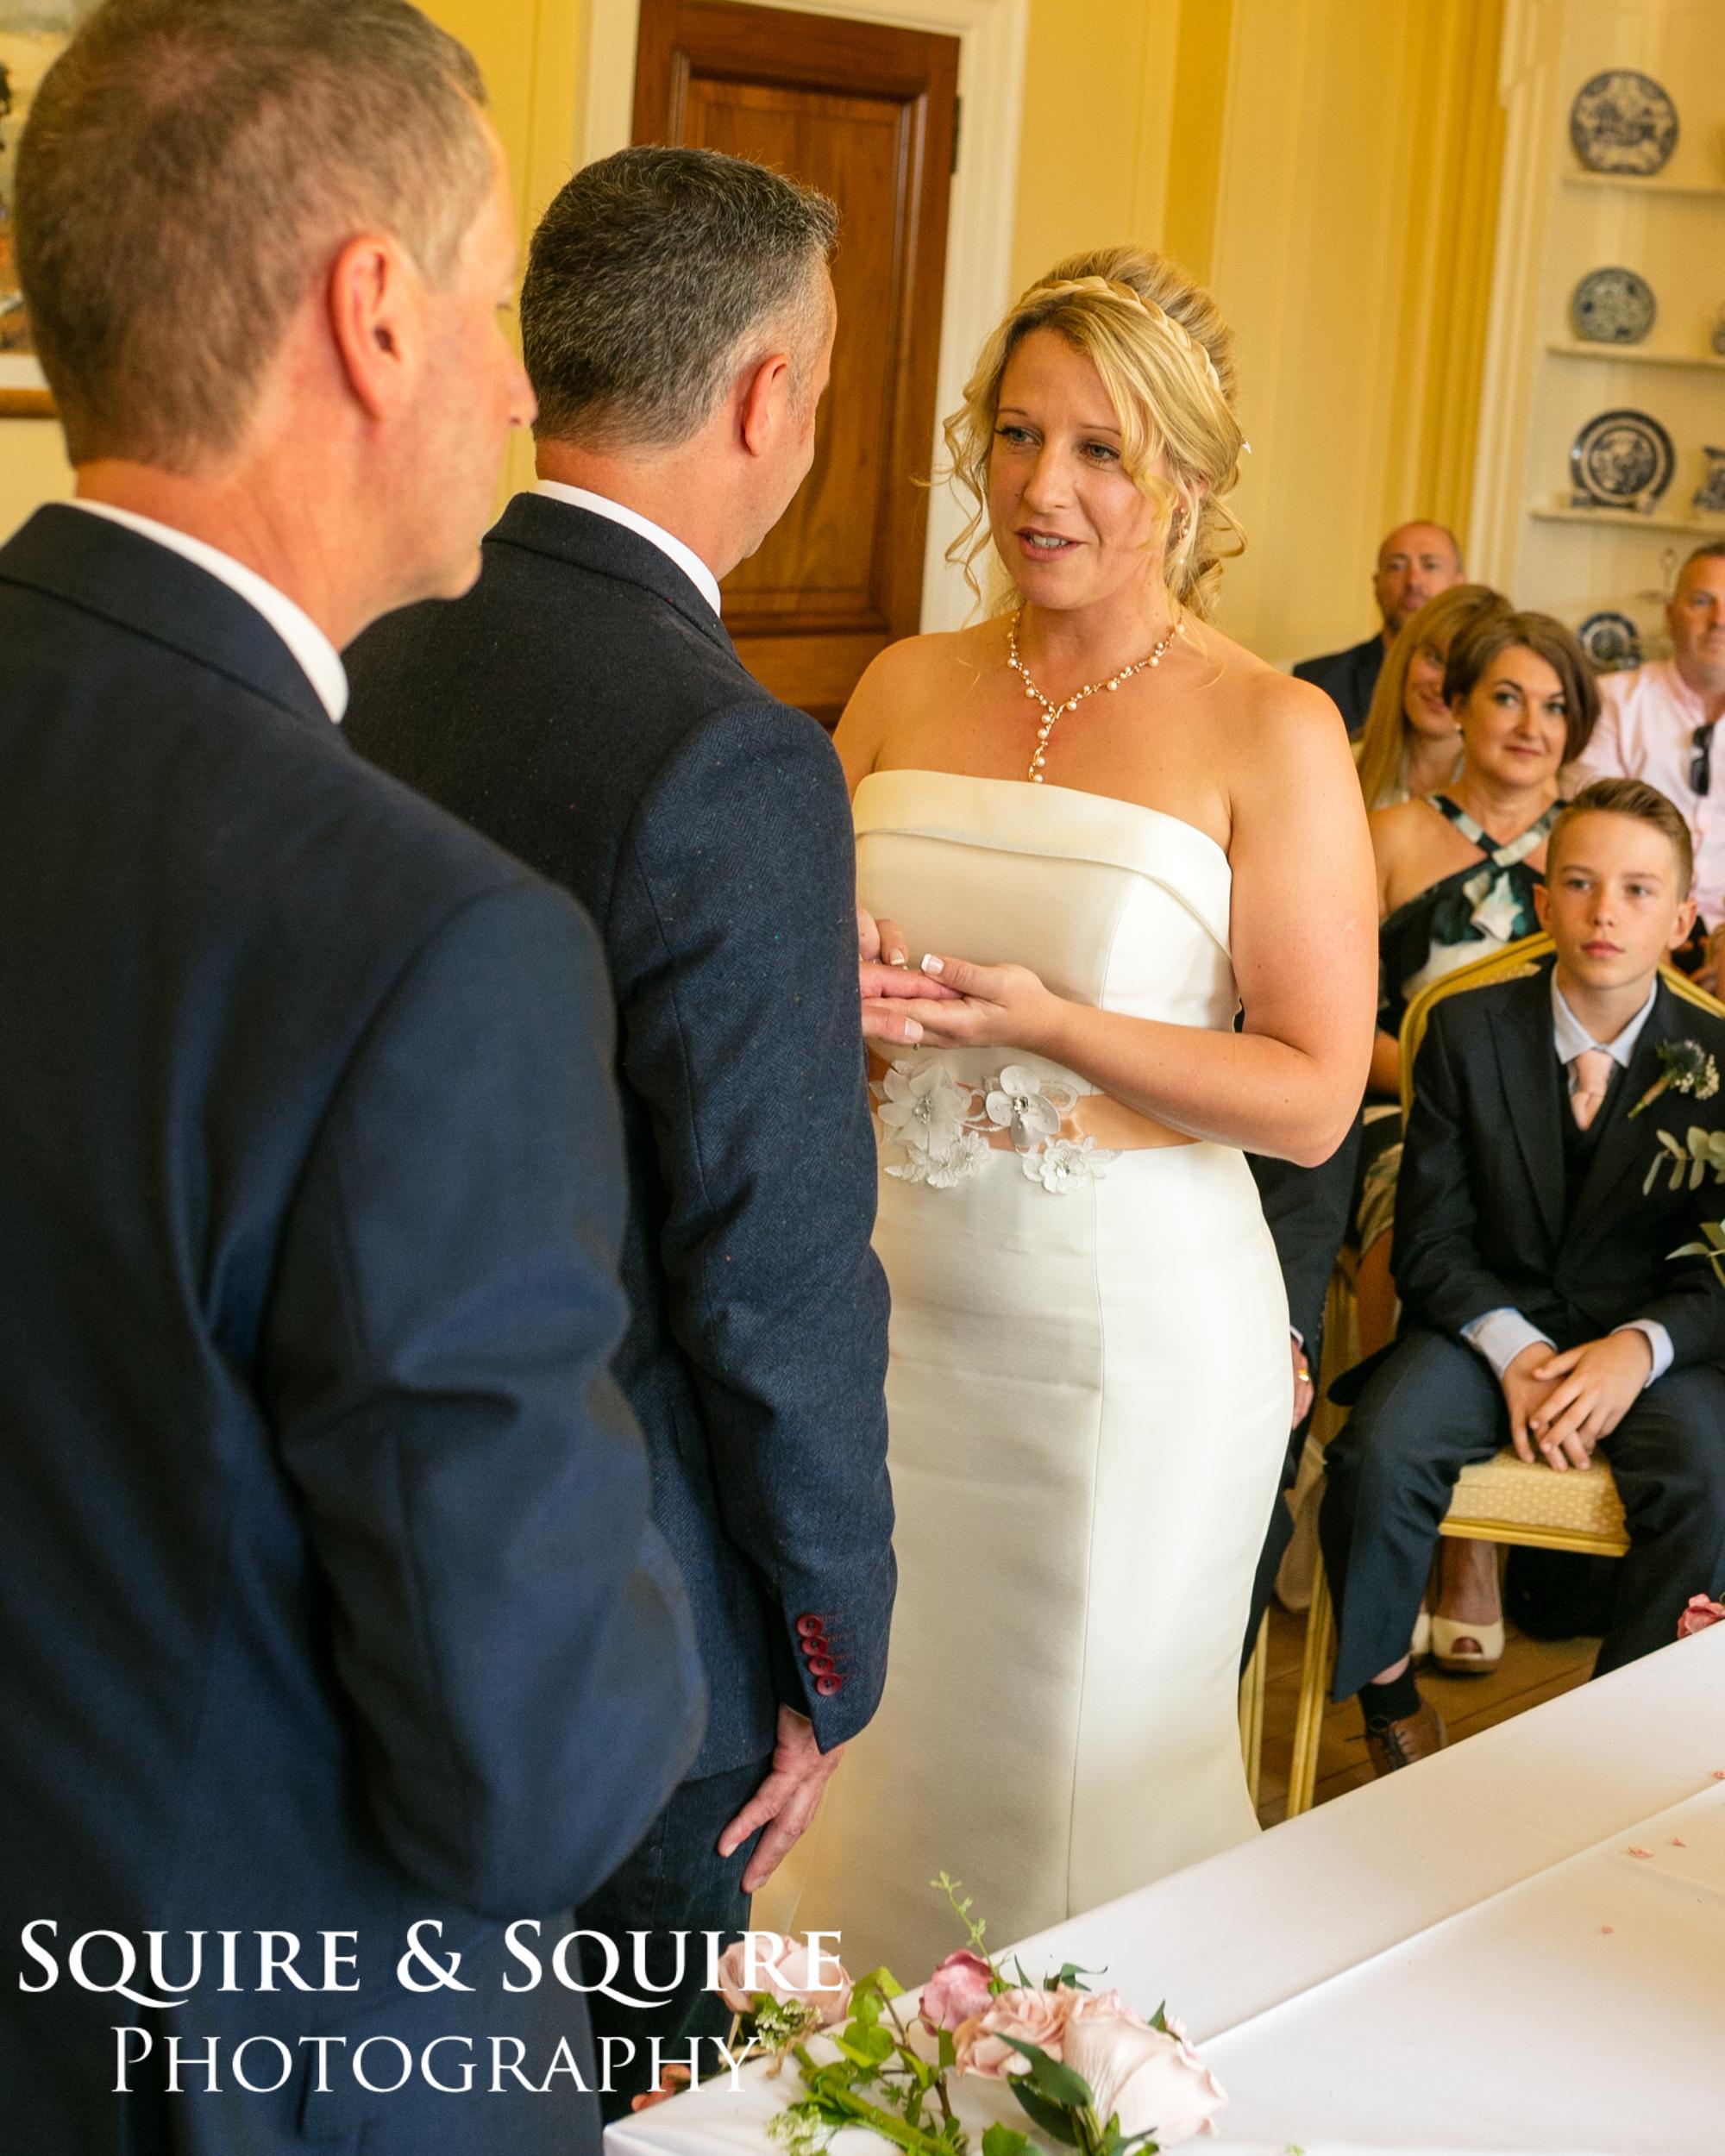 wedding_photography_catthorpe Manor (35 of 66).jpg